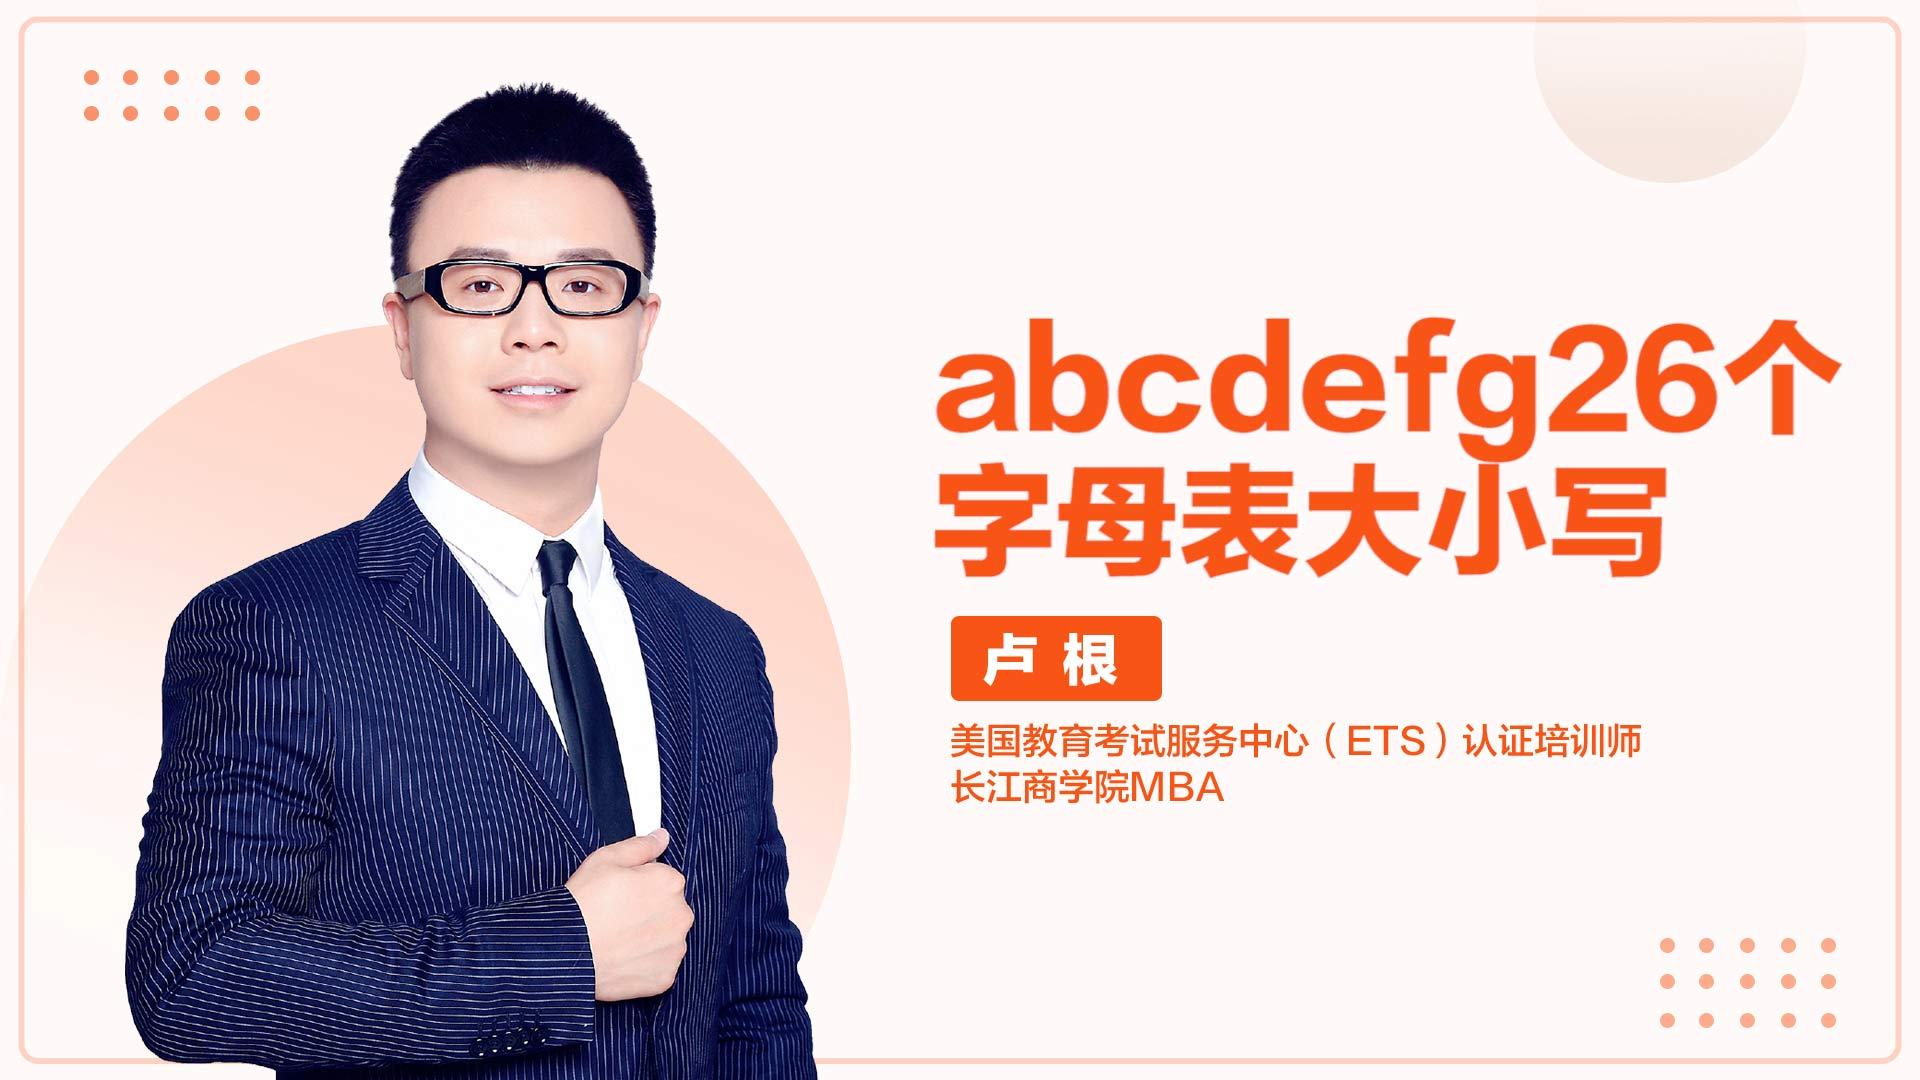 abcdefg26个字母表大小写